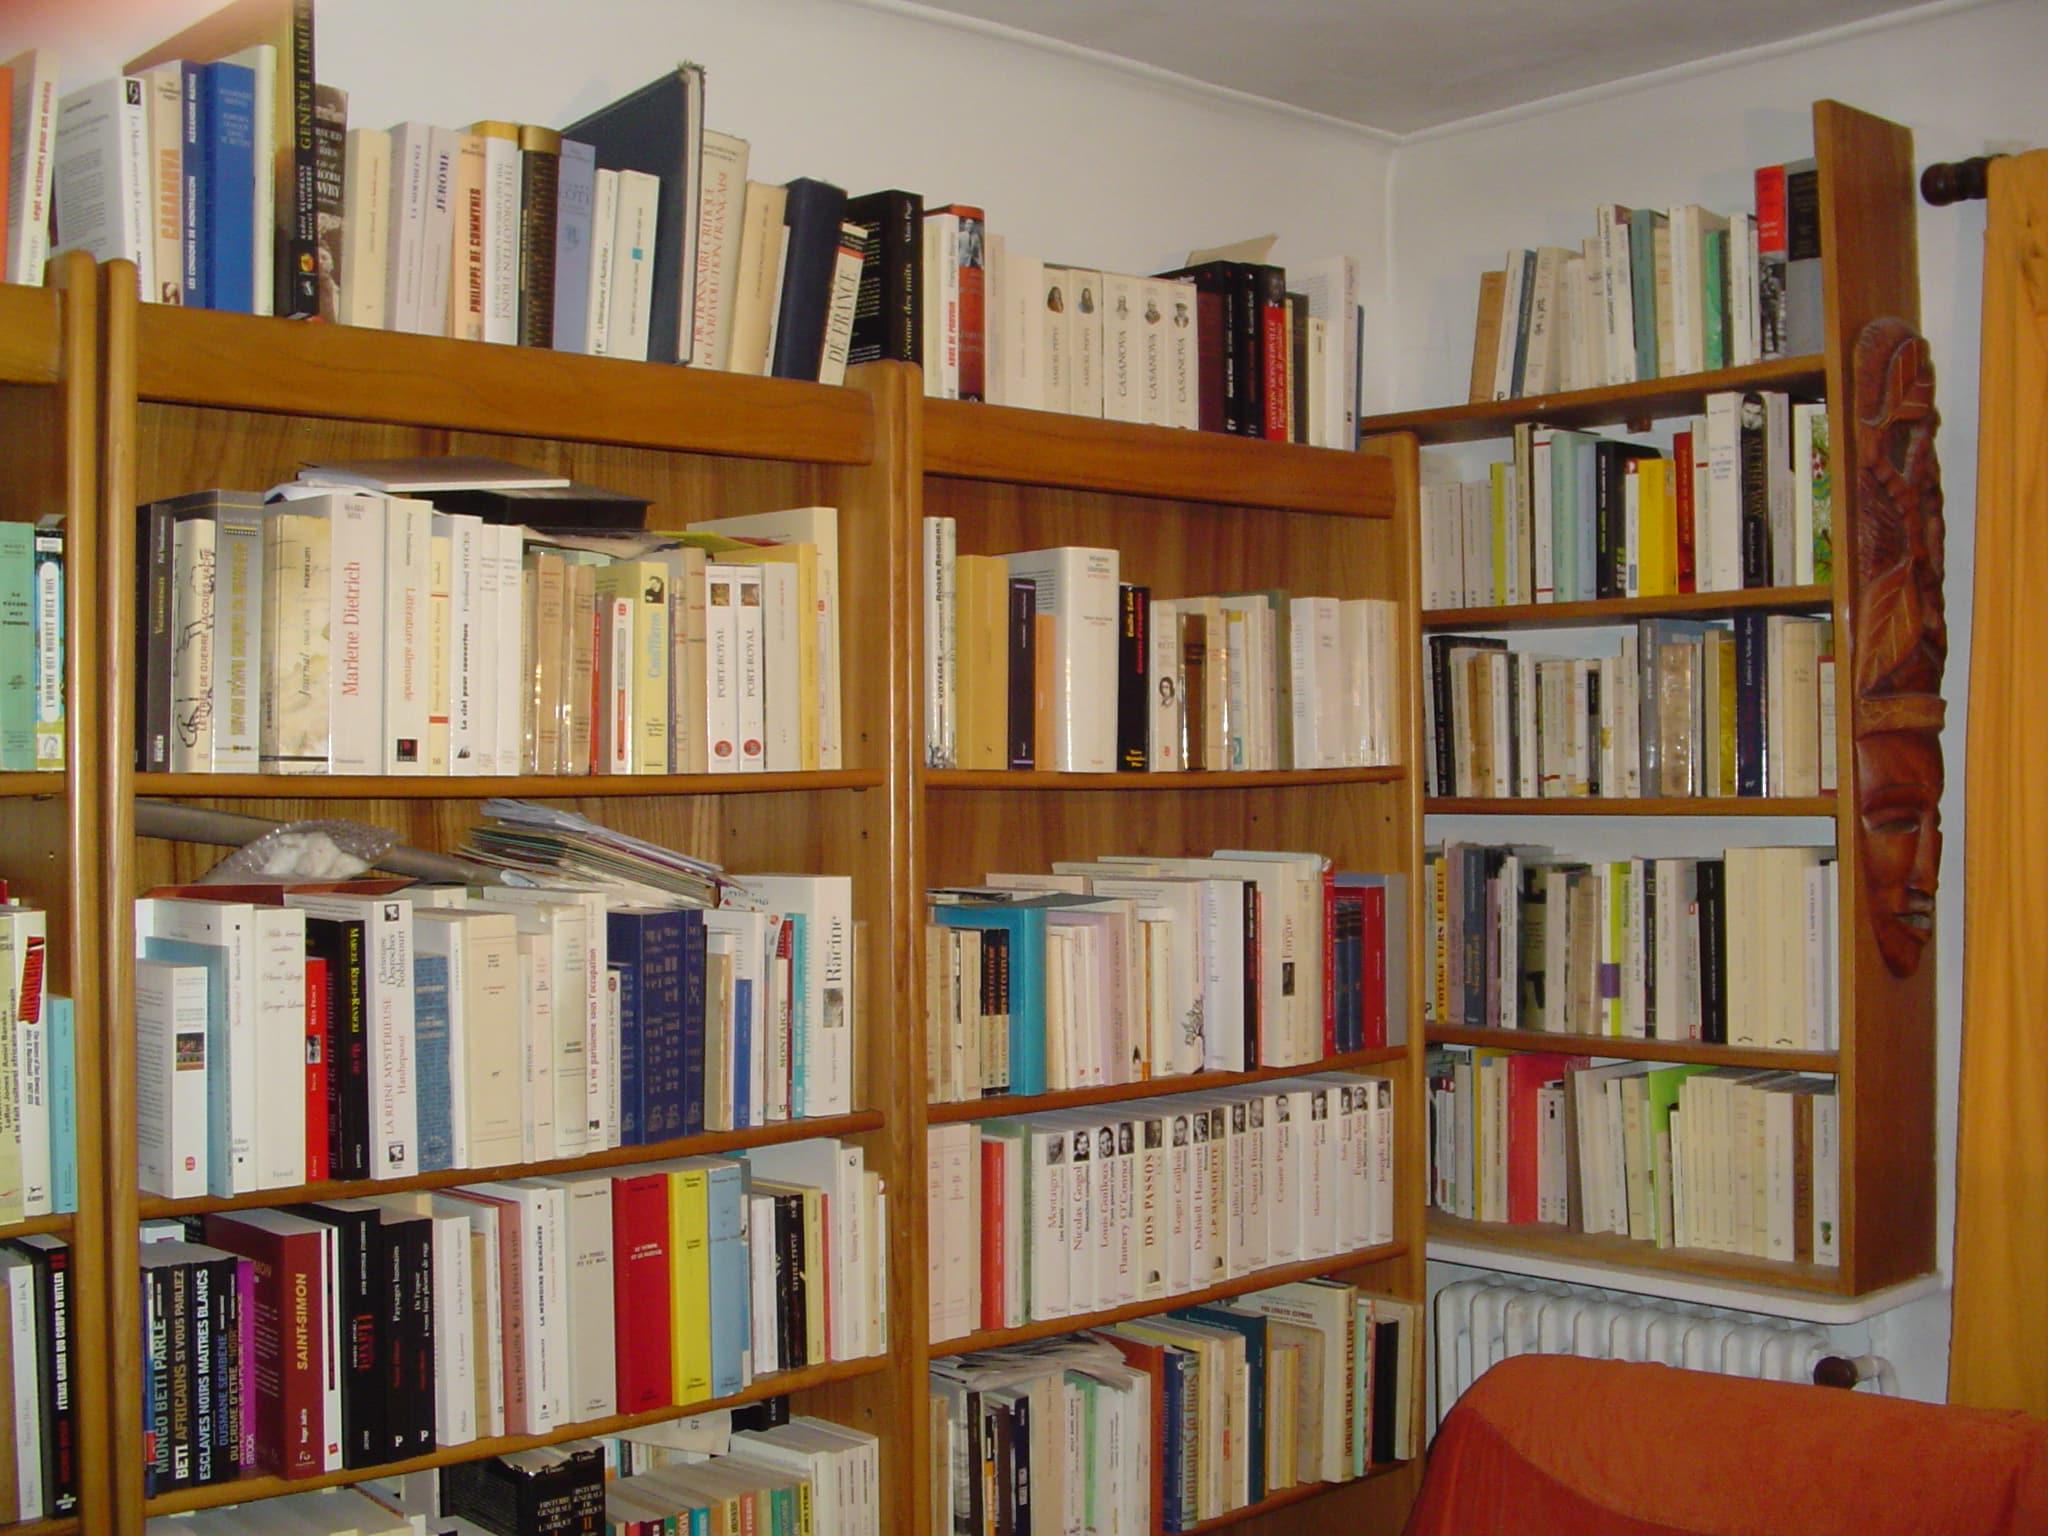 la compl mentarit de la biblioth que et le livre. Black Bedroom Furniture Sets. Home Design Ideas